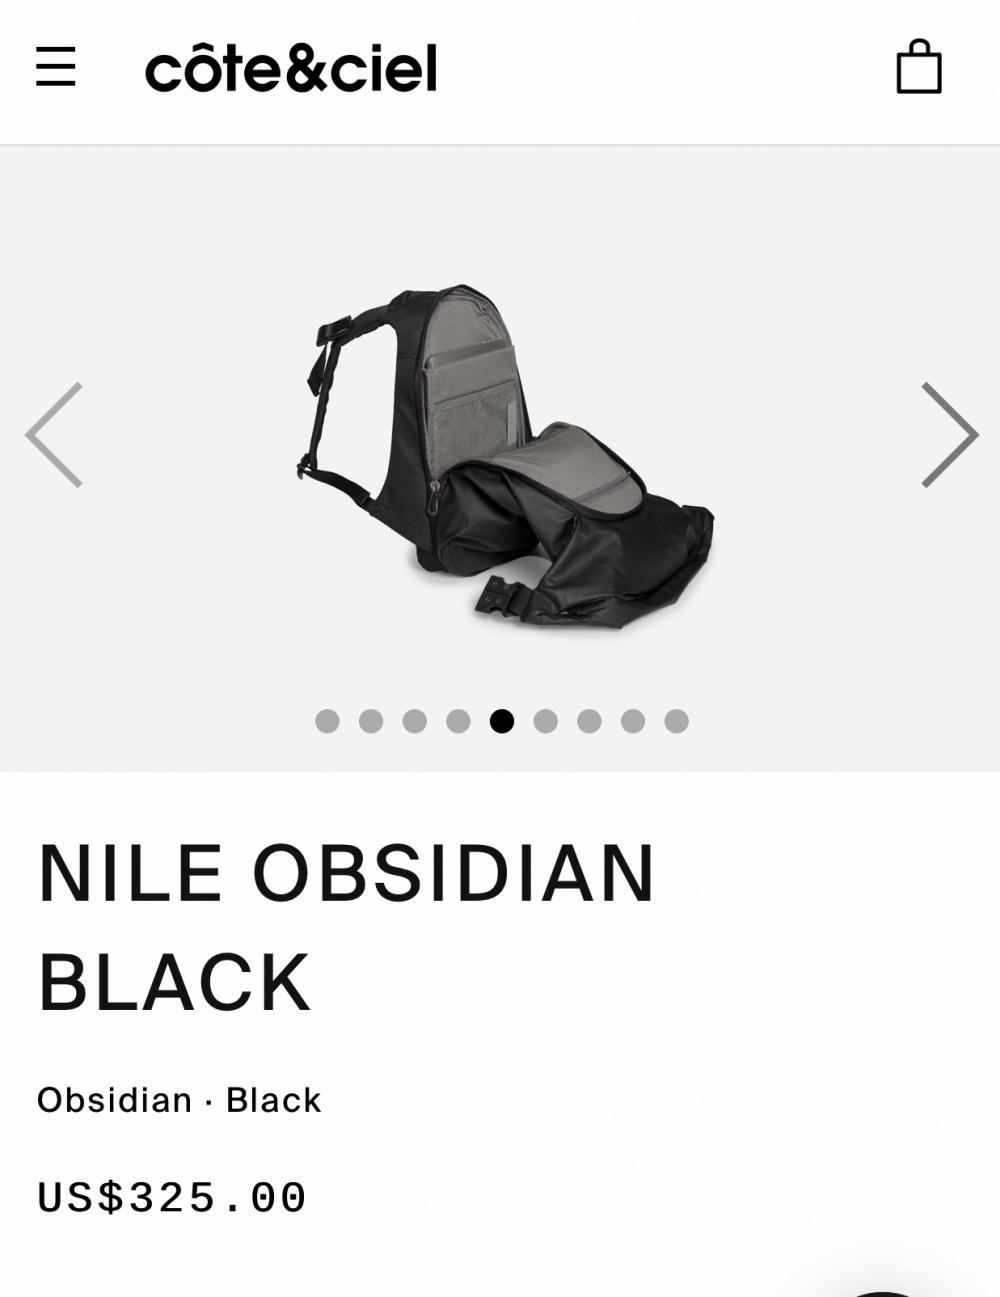 Рюкзак Cote&ciel Nile obsidian black